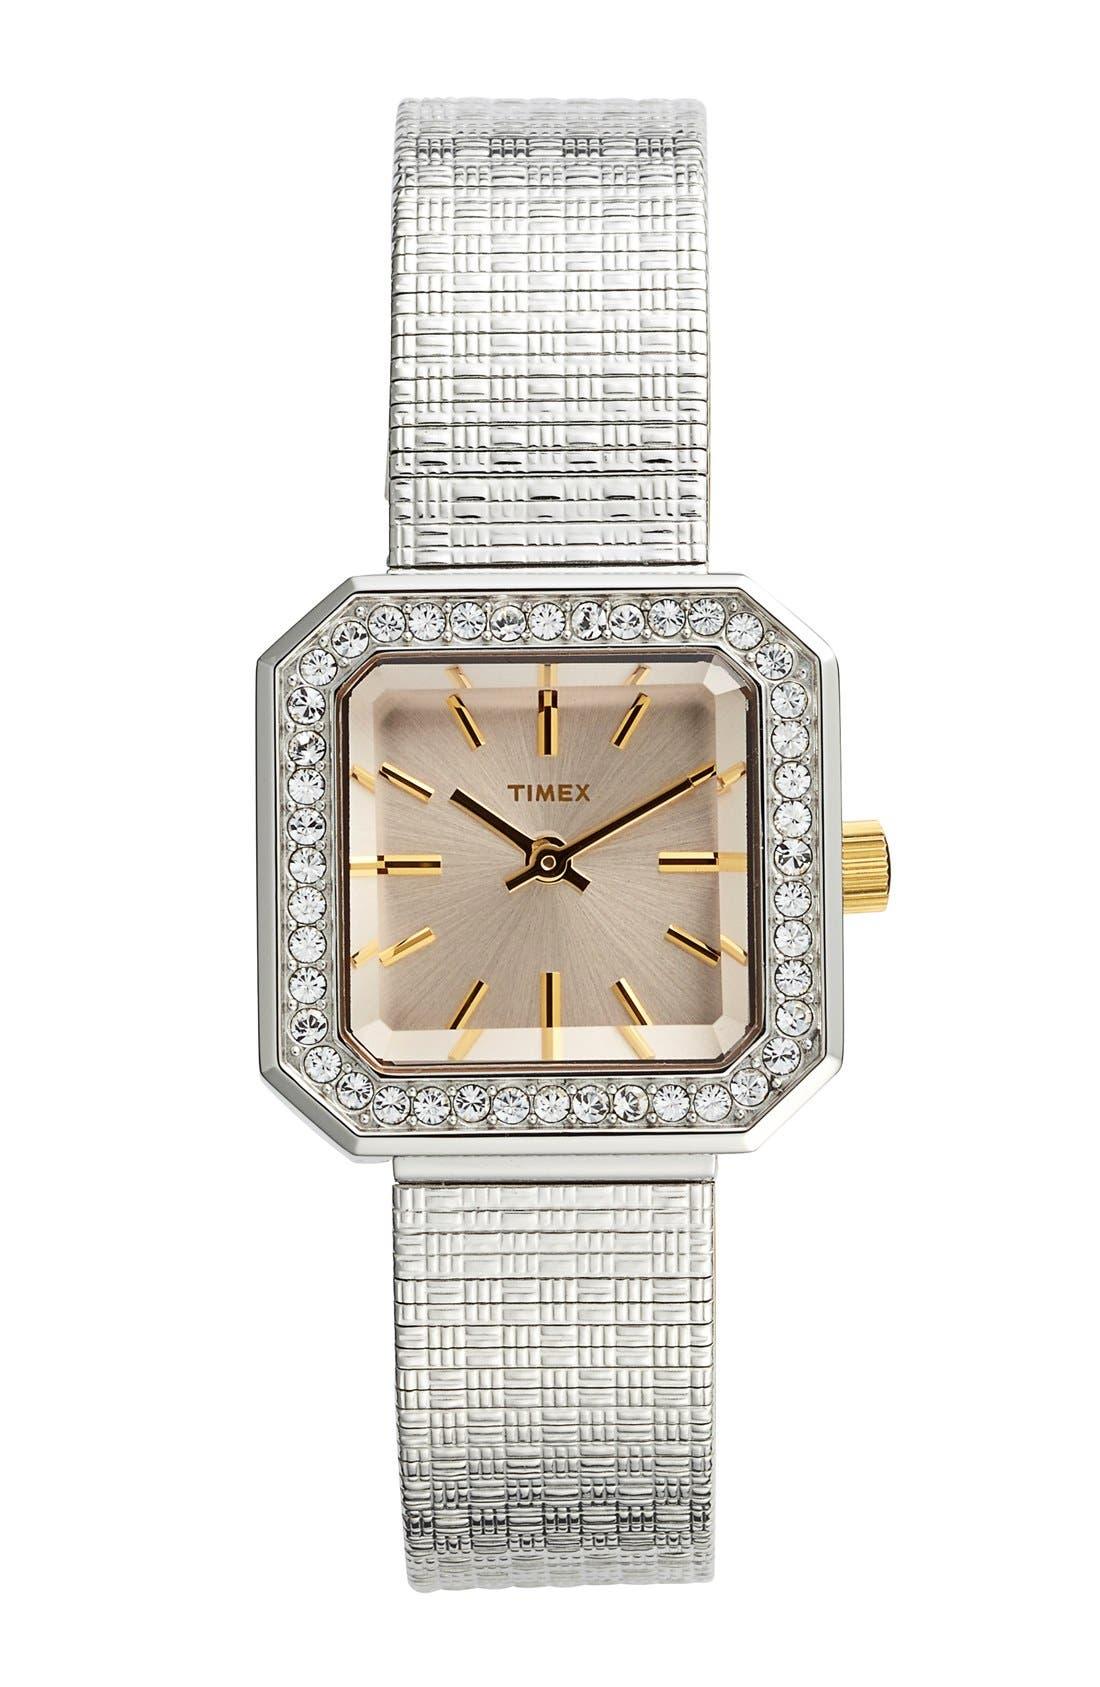 Main Image - Timex® 'Starlight' Crystal Bezel Square Mesh Strap Watch, 25mm